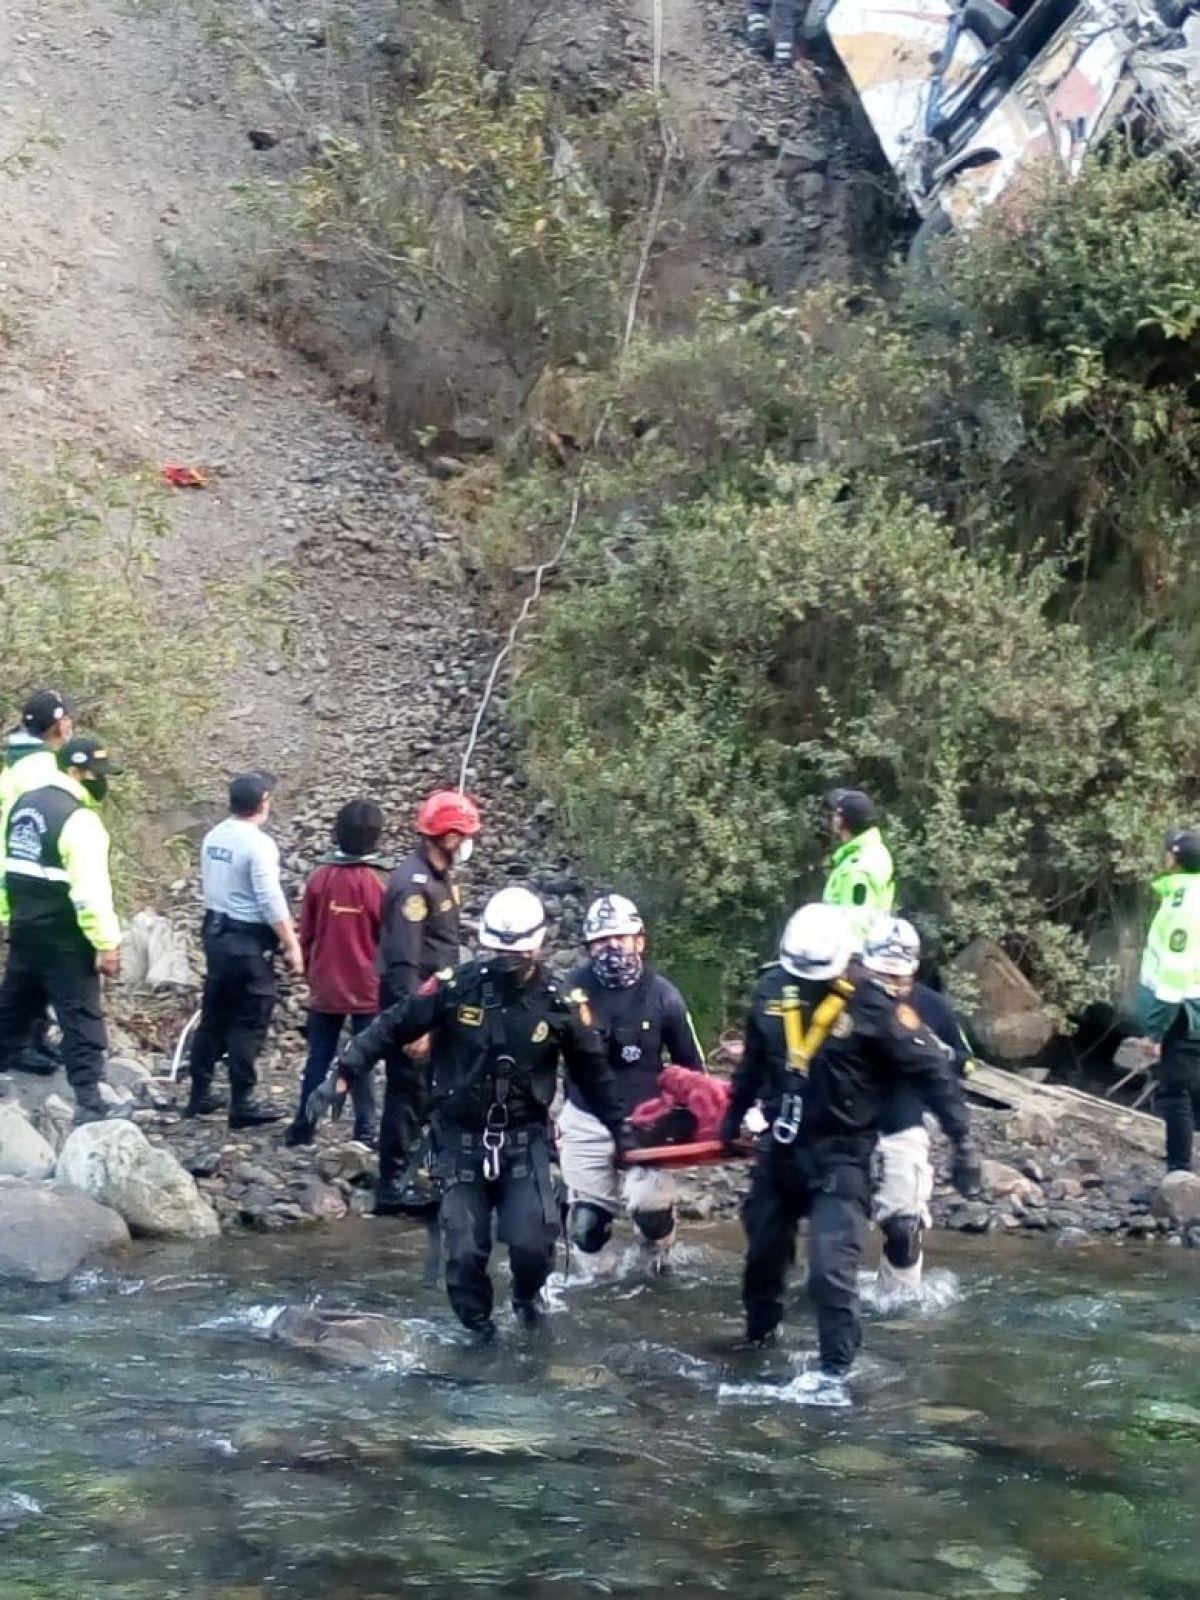 Peru'da otobüs uçuruma yuvarlandı: 29 ölü #2